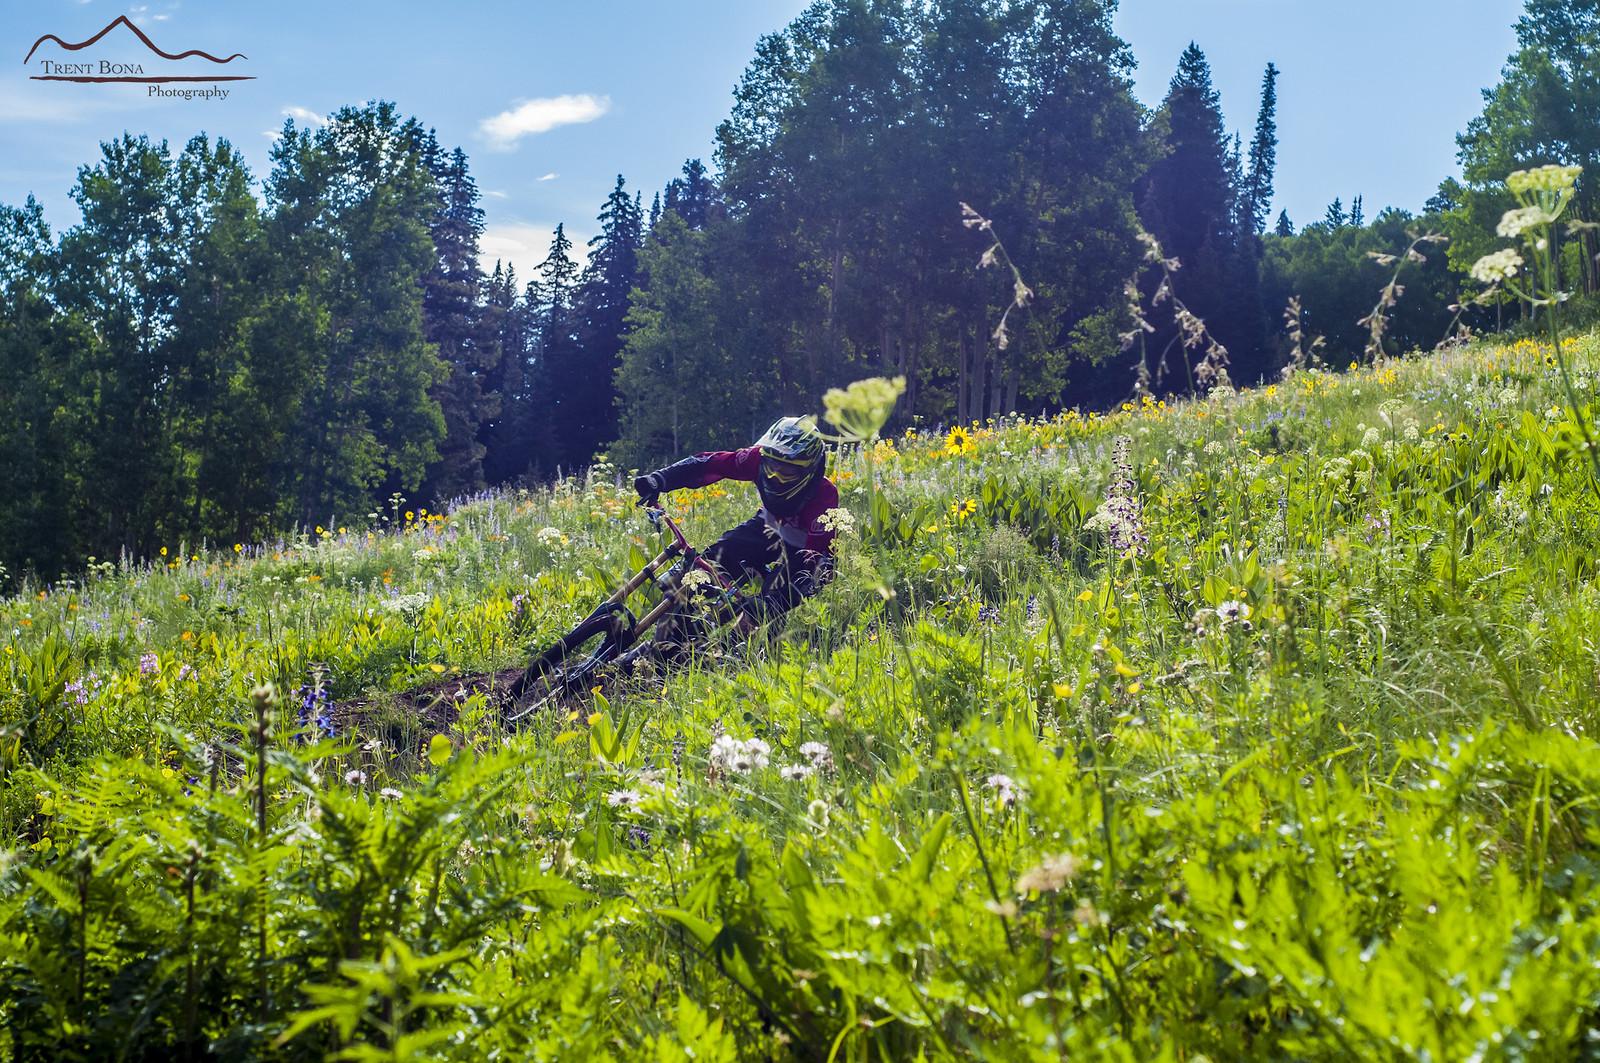 Digging Deep - Evolution Bike Park - Mountain Biking Pictures - Vital MTB